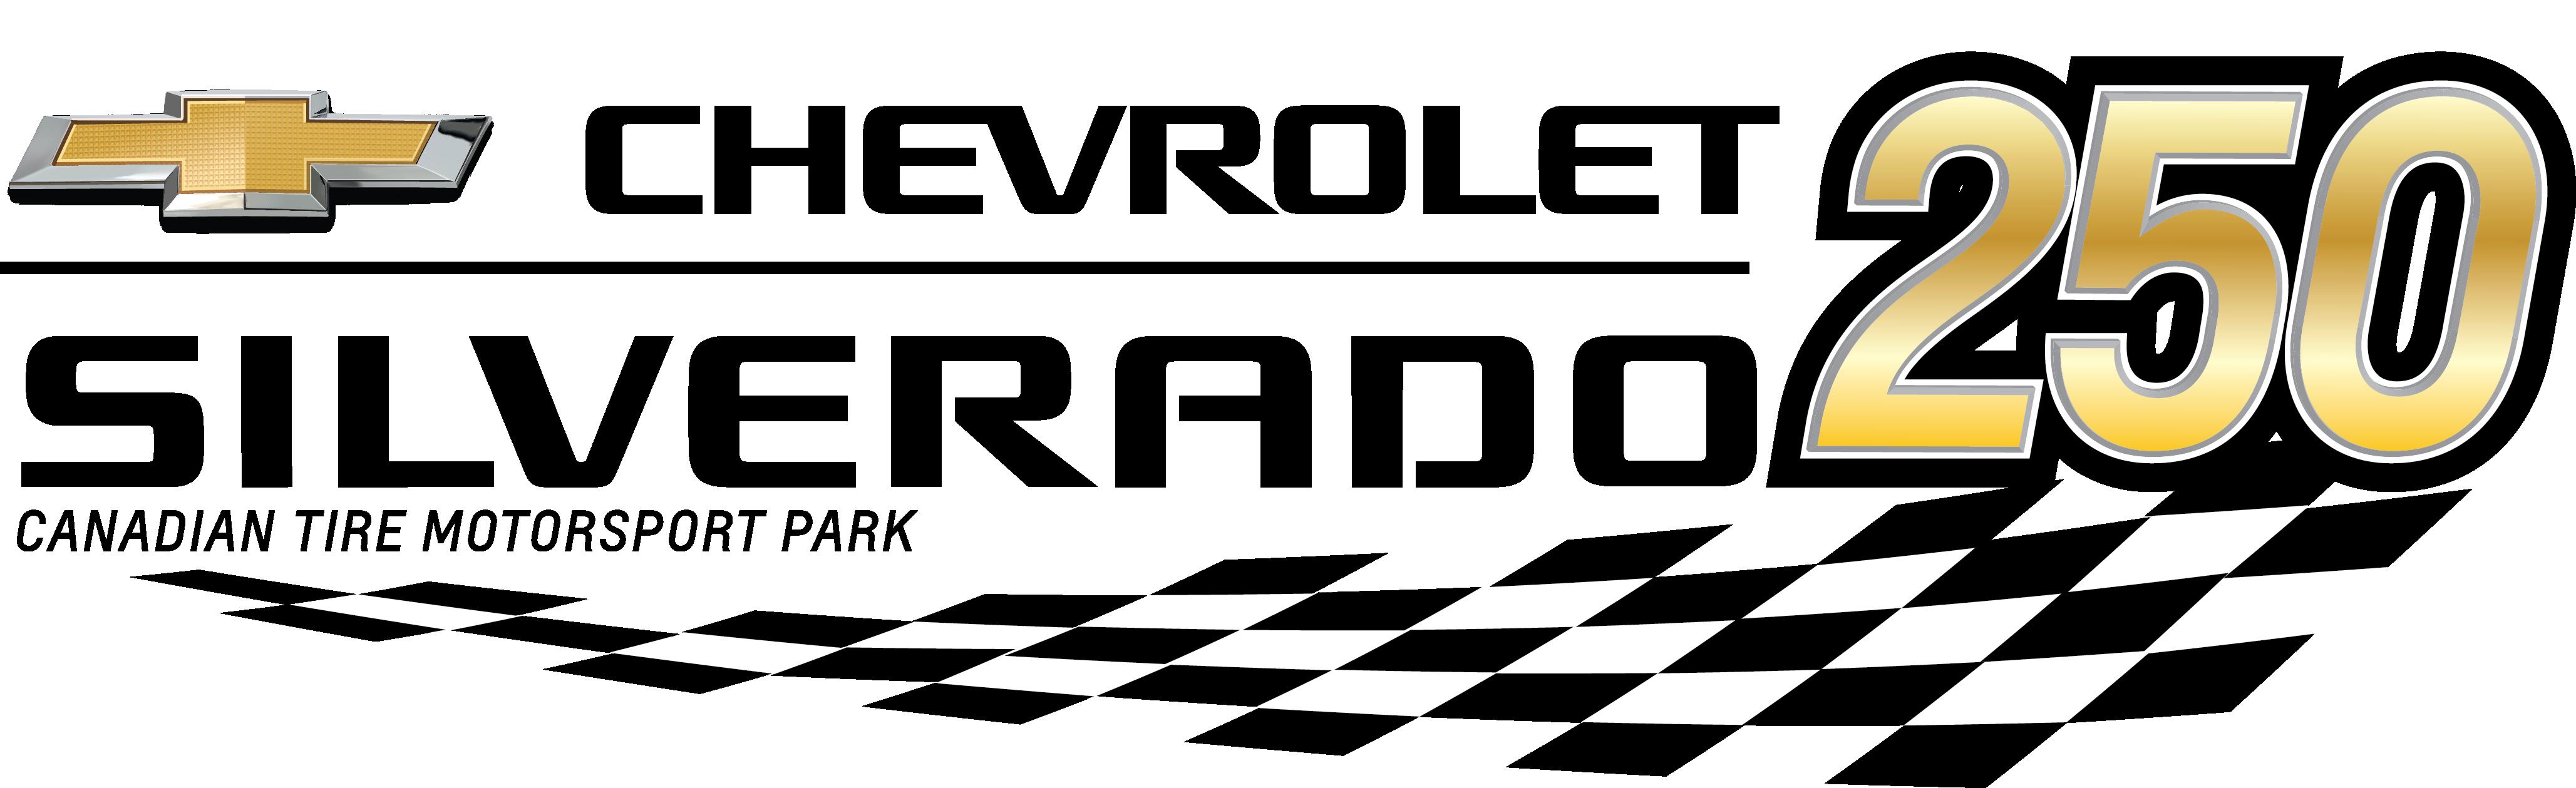 Dgr Crosley Gander Trucks Advance Canadian Tire Motorsport Park Speedwaymedia Com